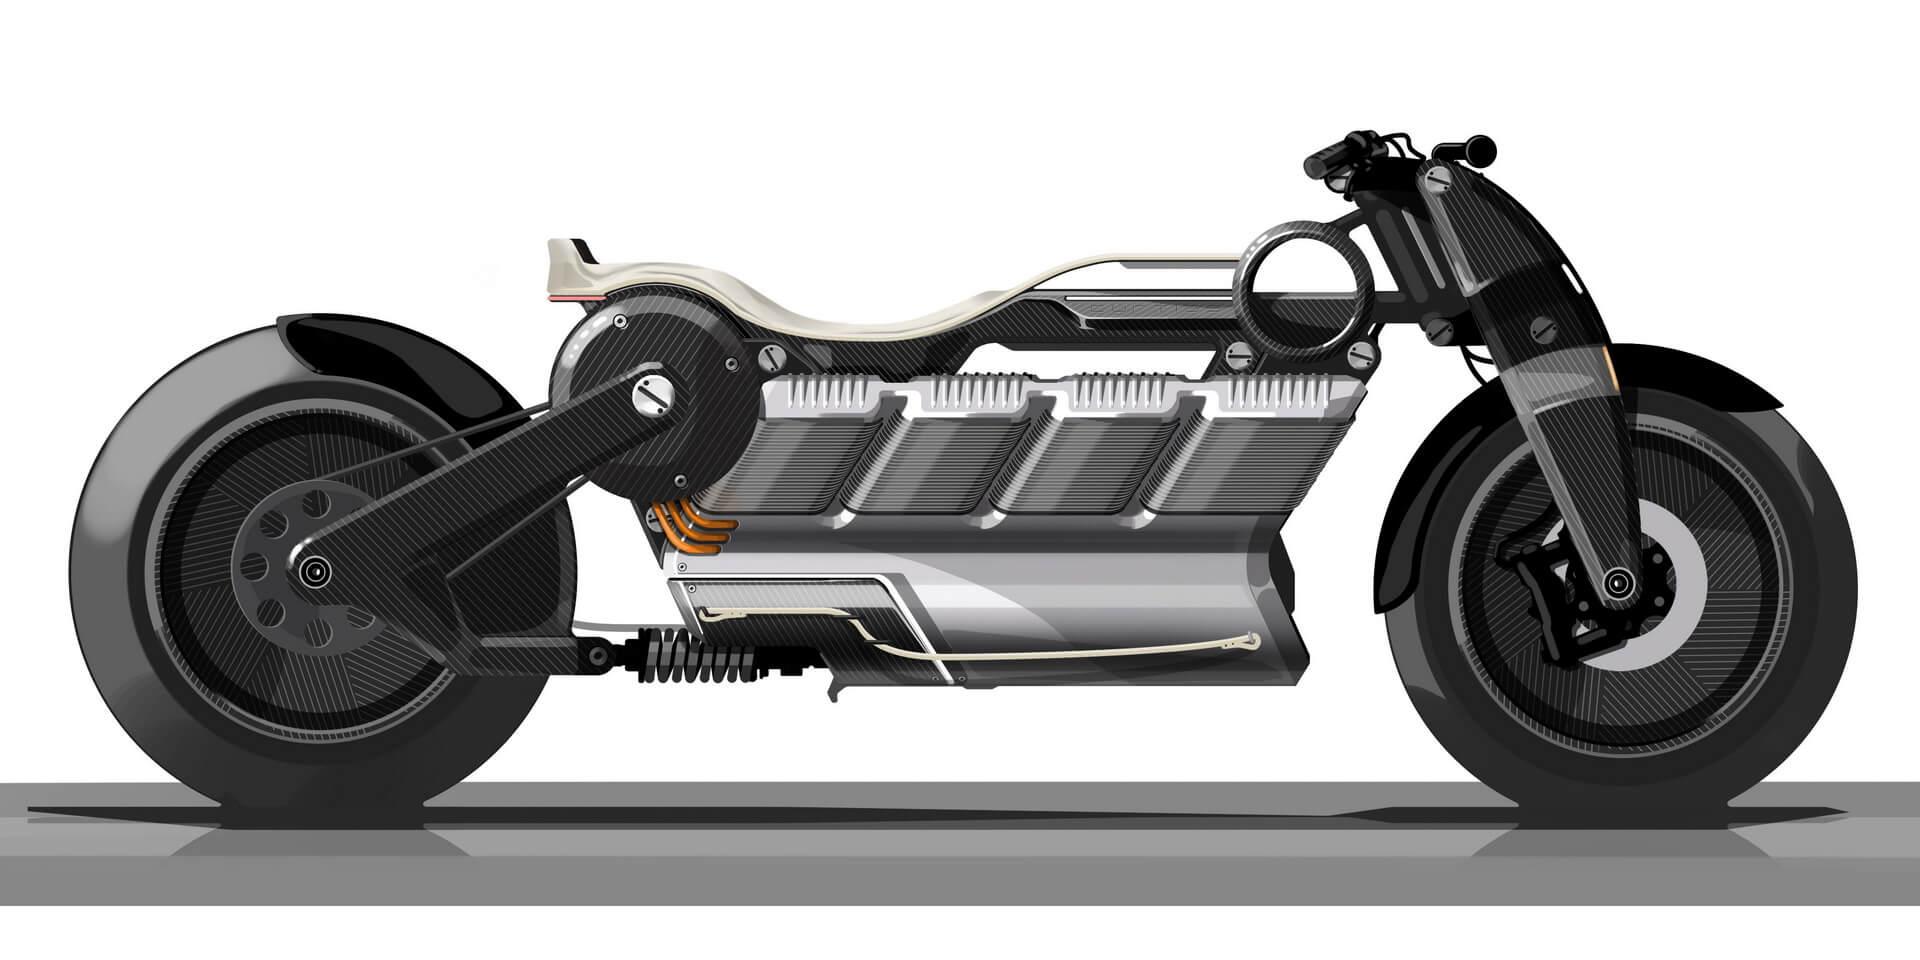 Концепт электрического мотоцикла V8 Curtiss Motorcycles